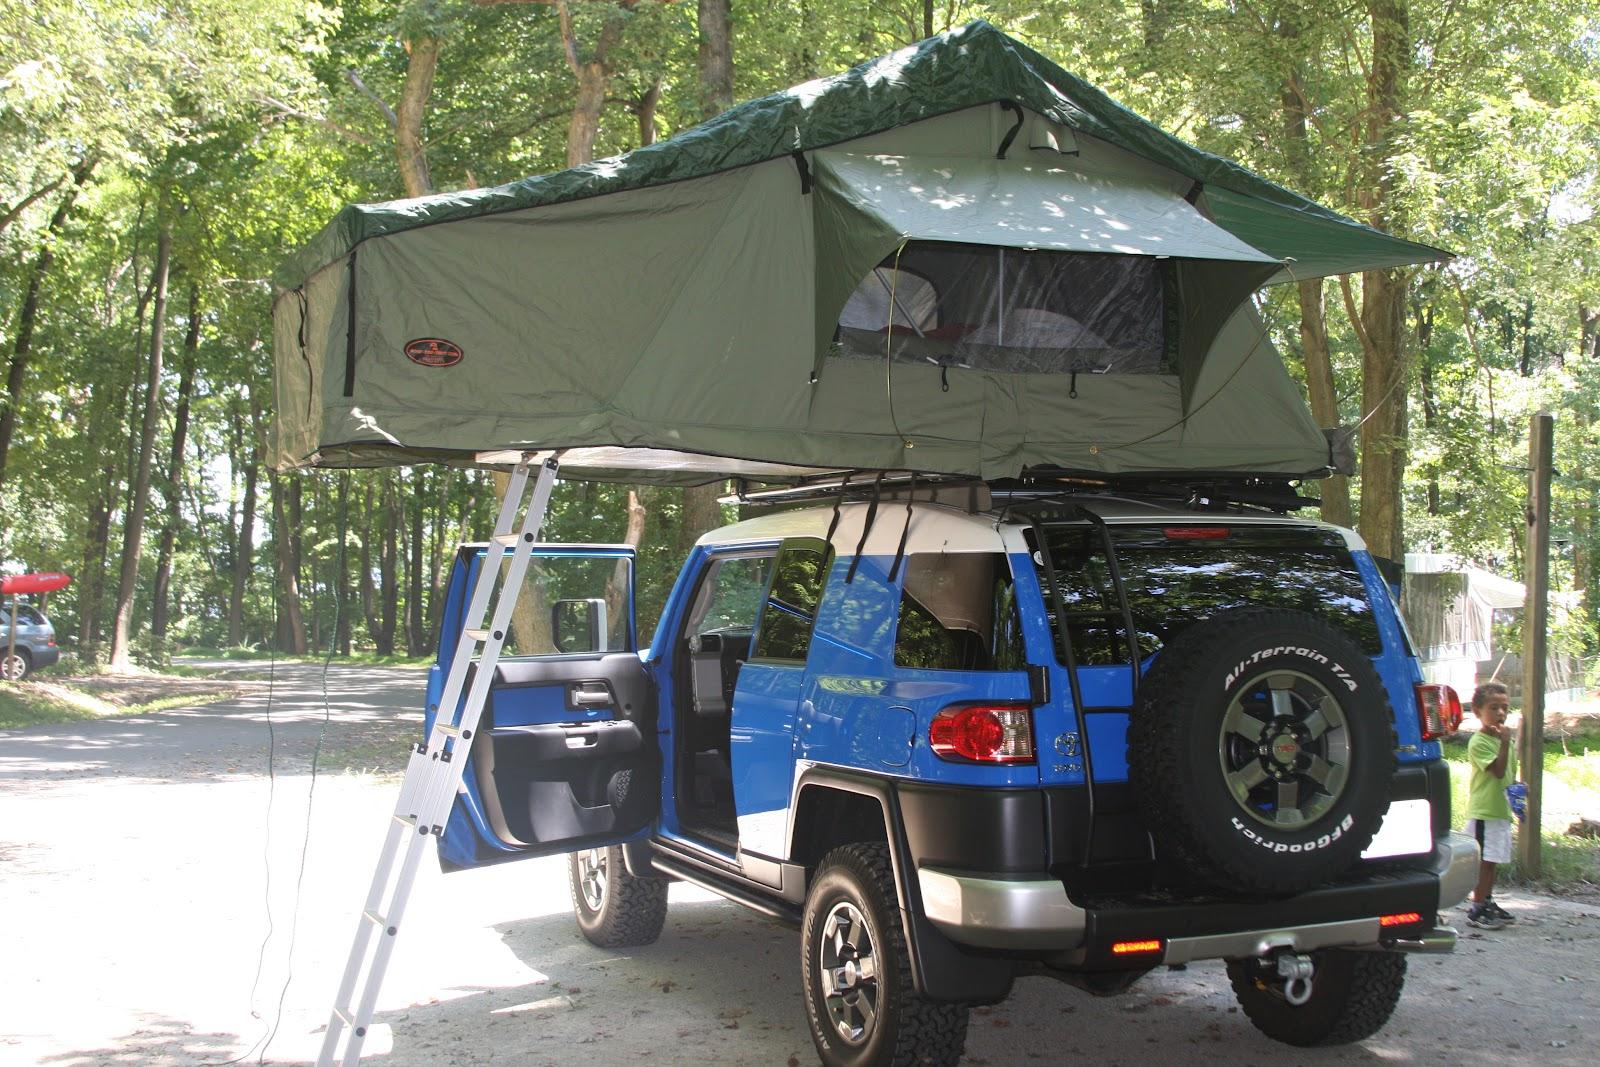 My Fj Cruiser Roof Top Tent